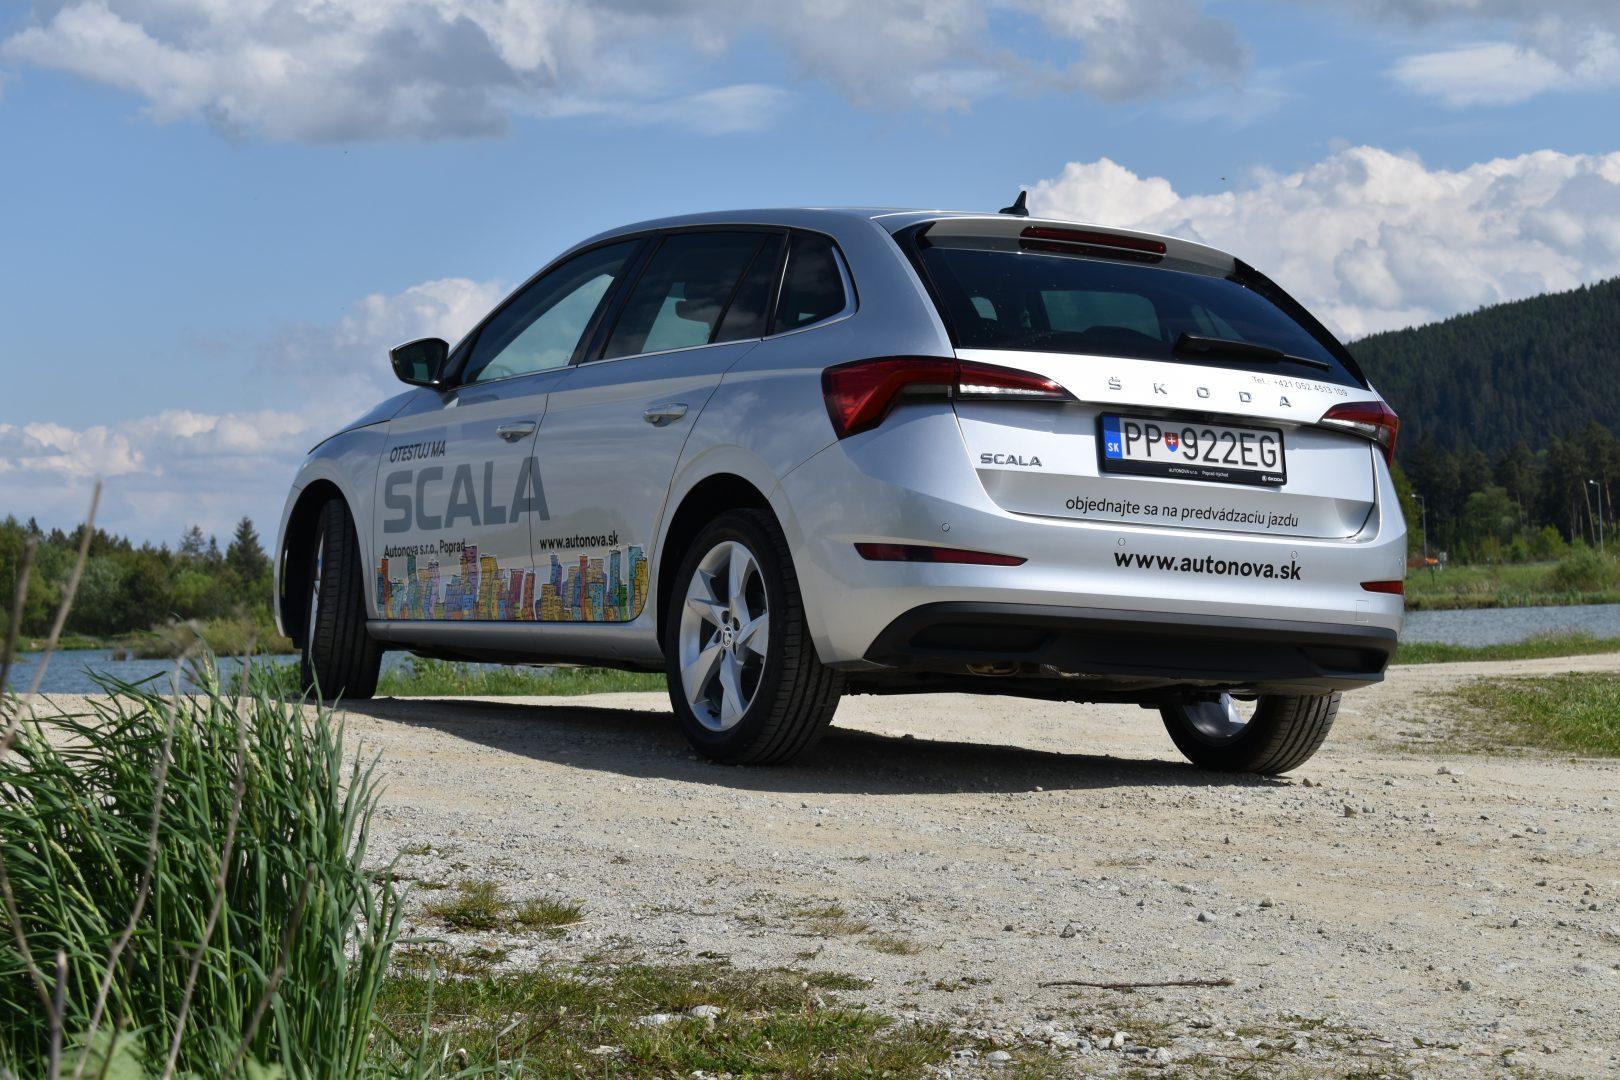 Scala-9